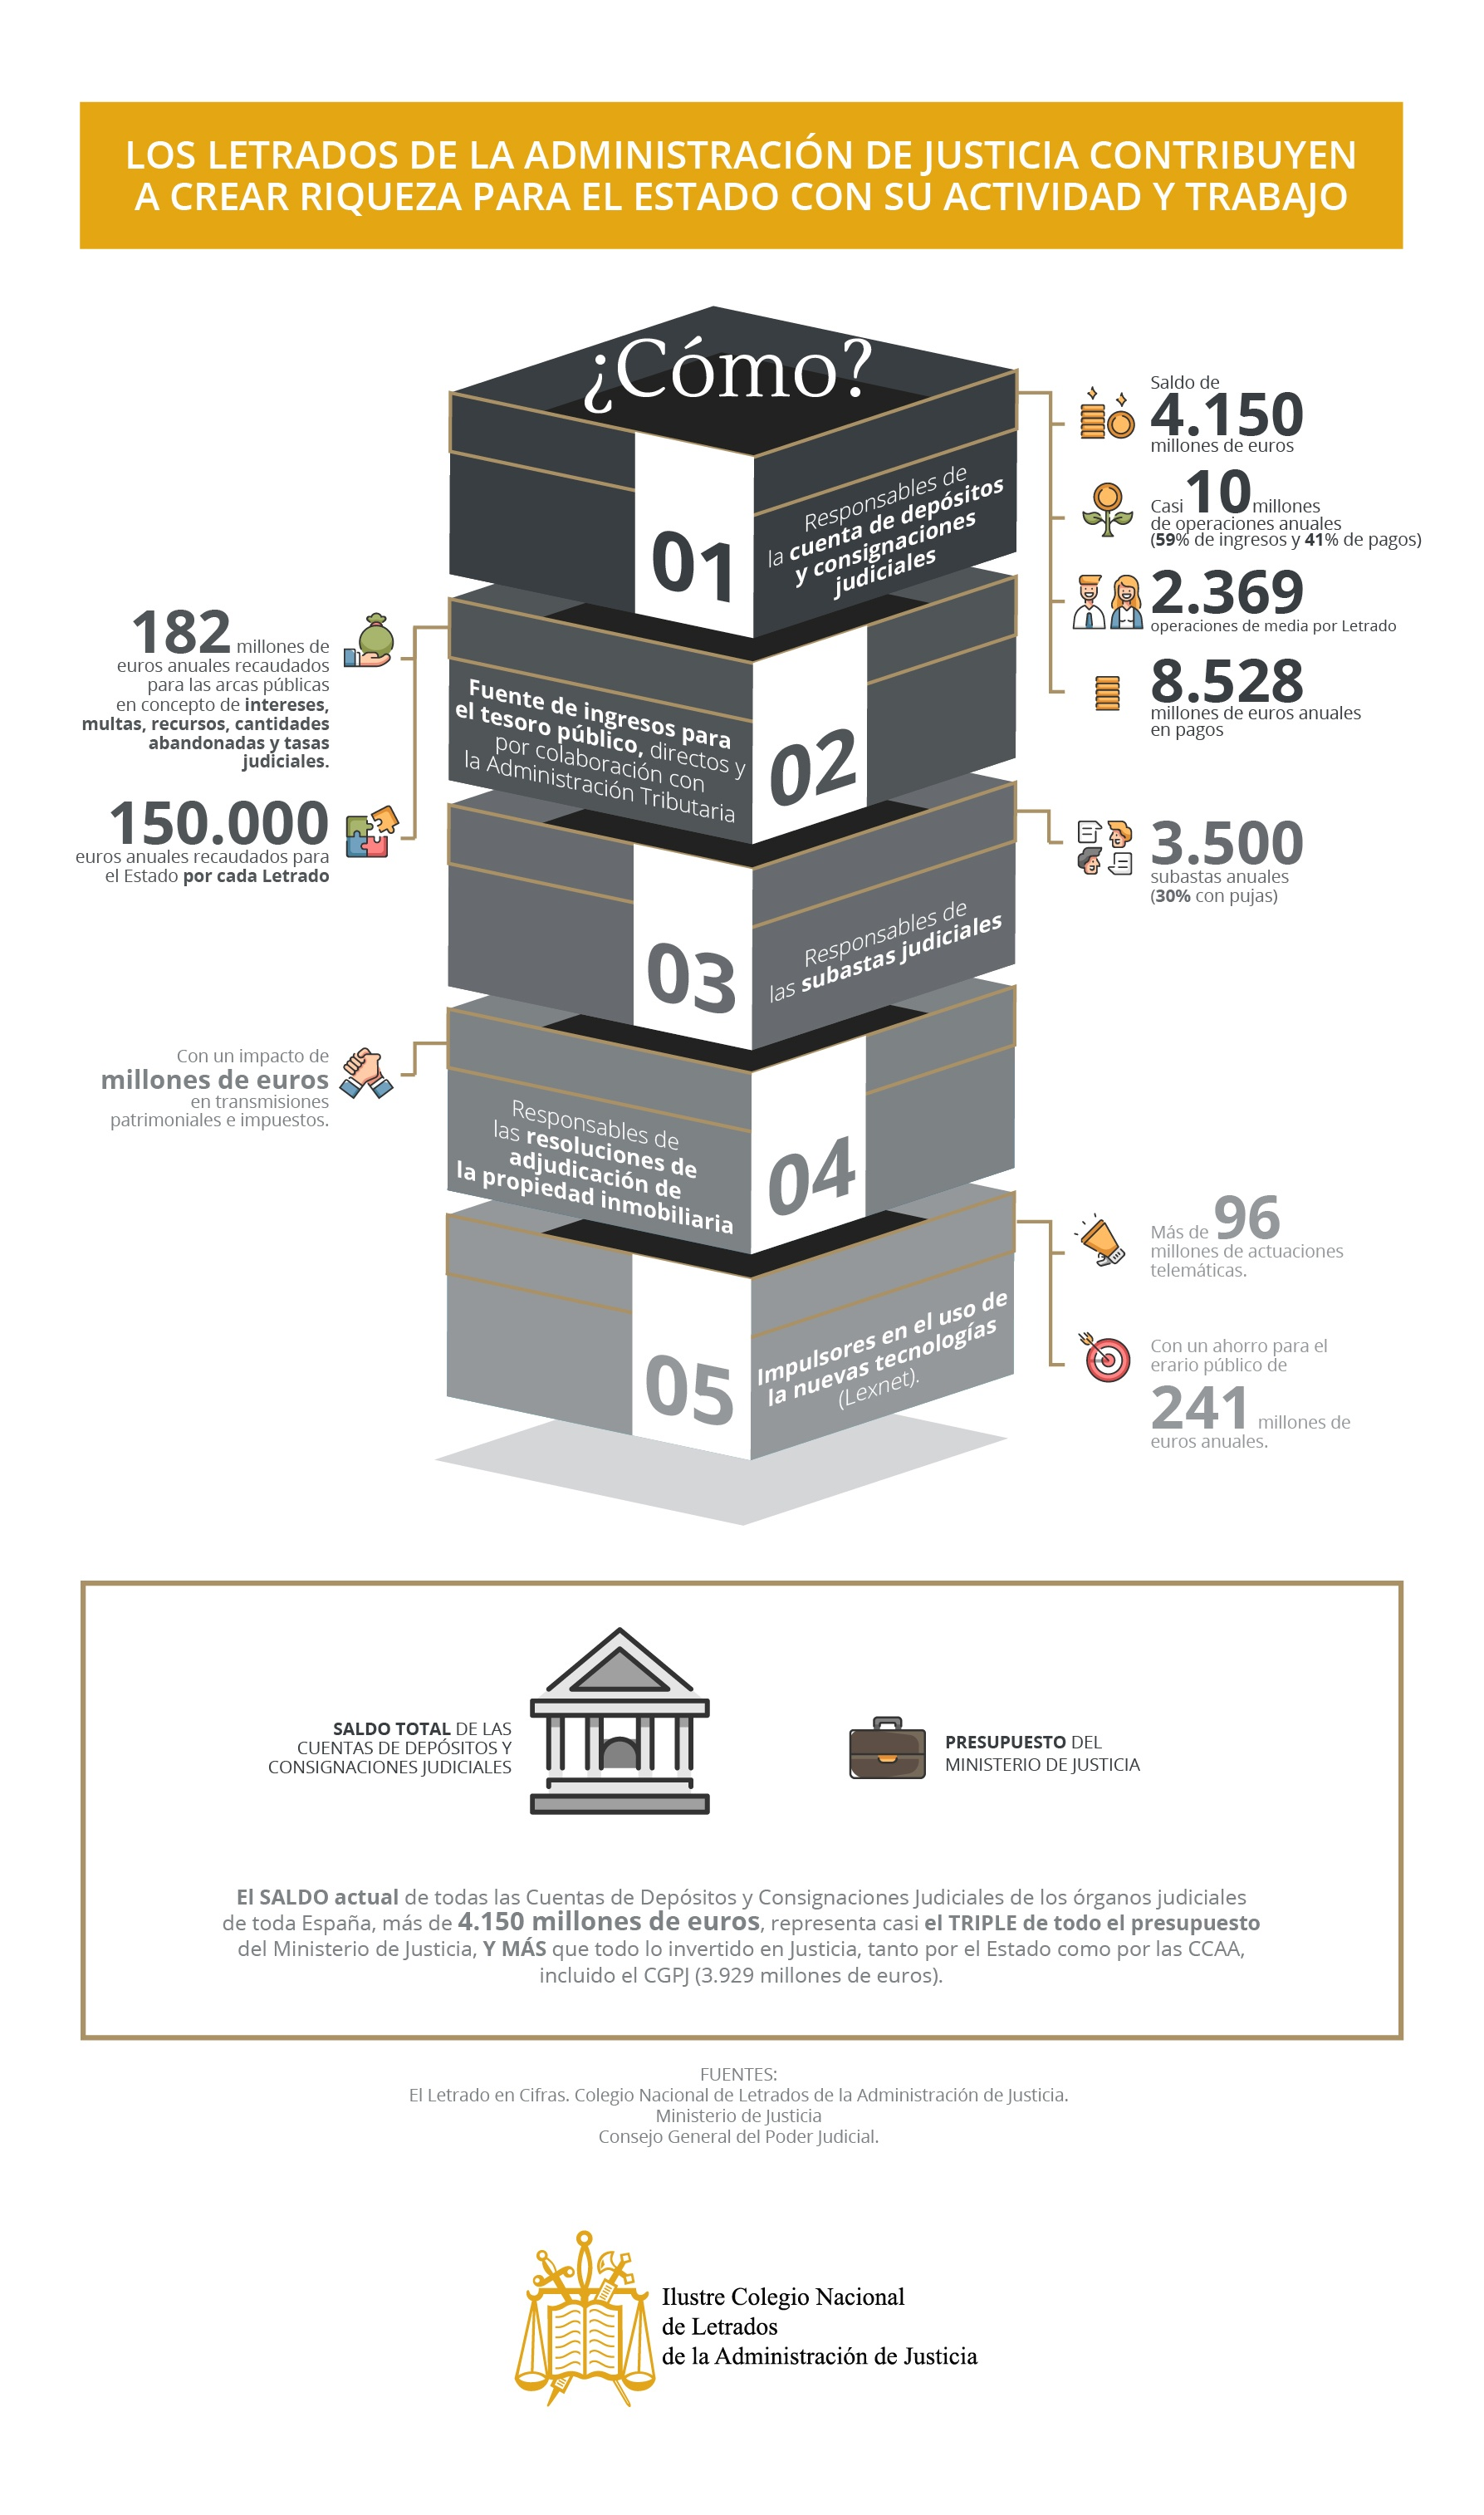 Infografia_letrados justicia Contribuyen a crear riqueza para el estado_